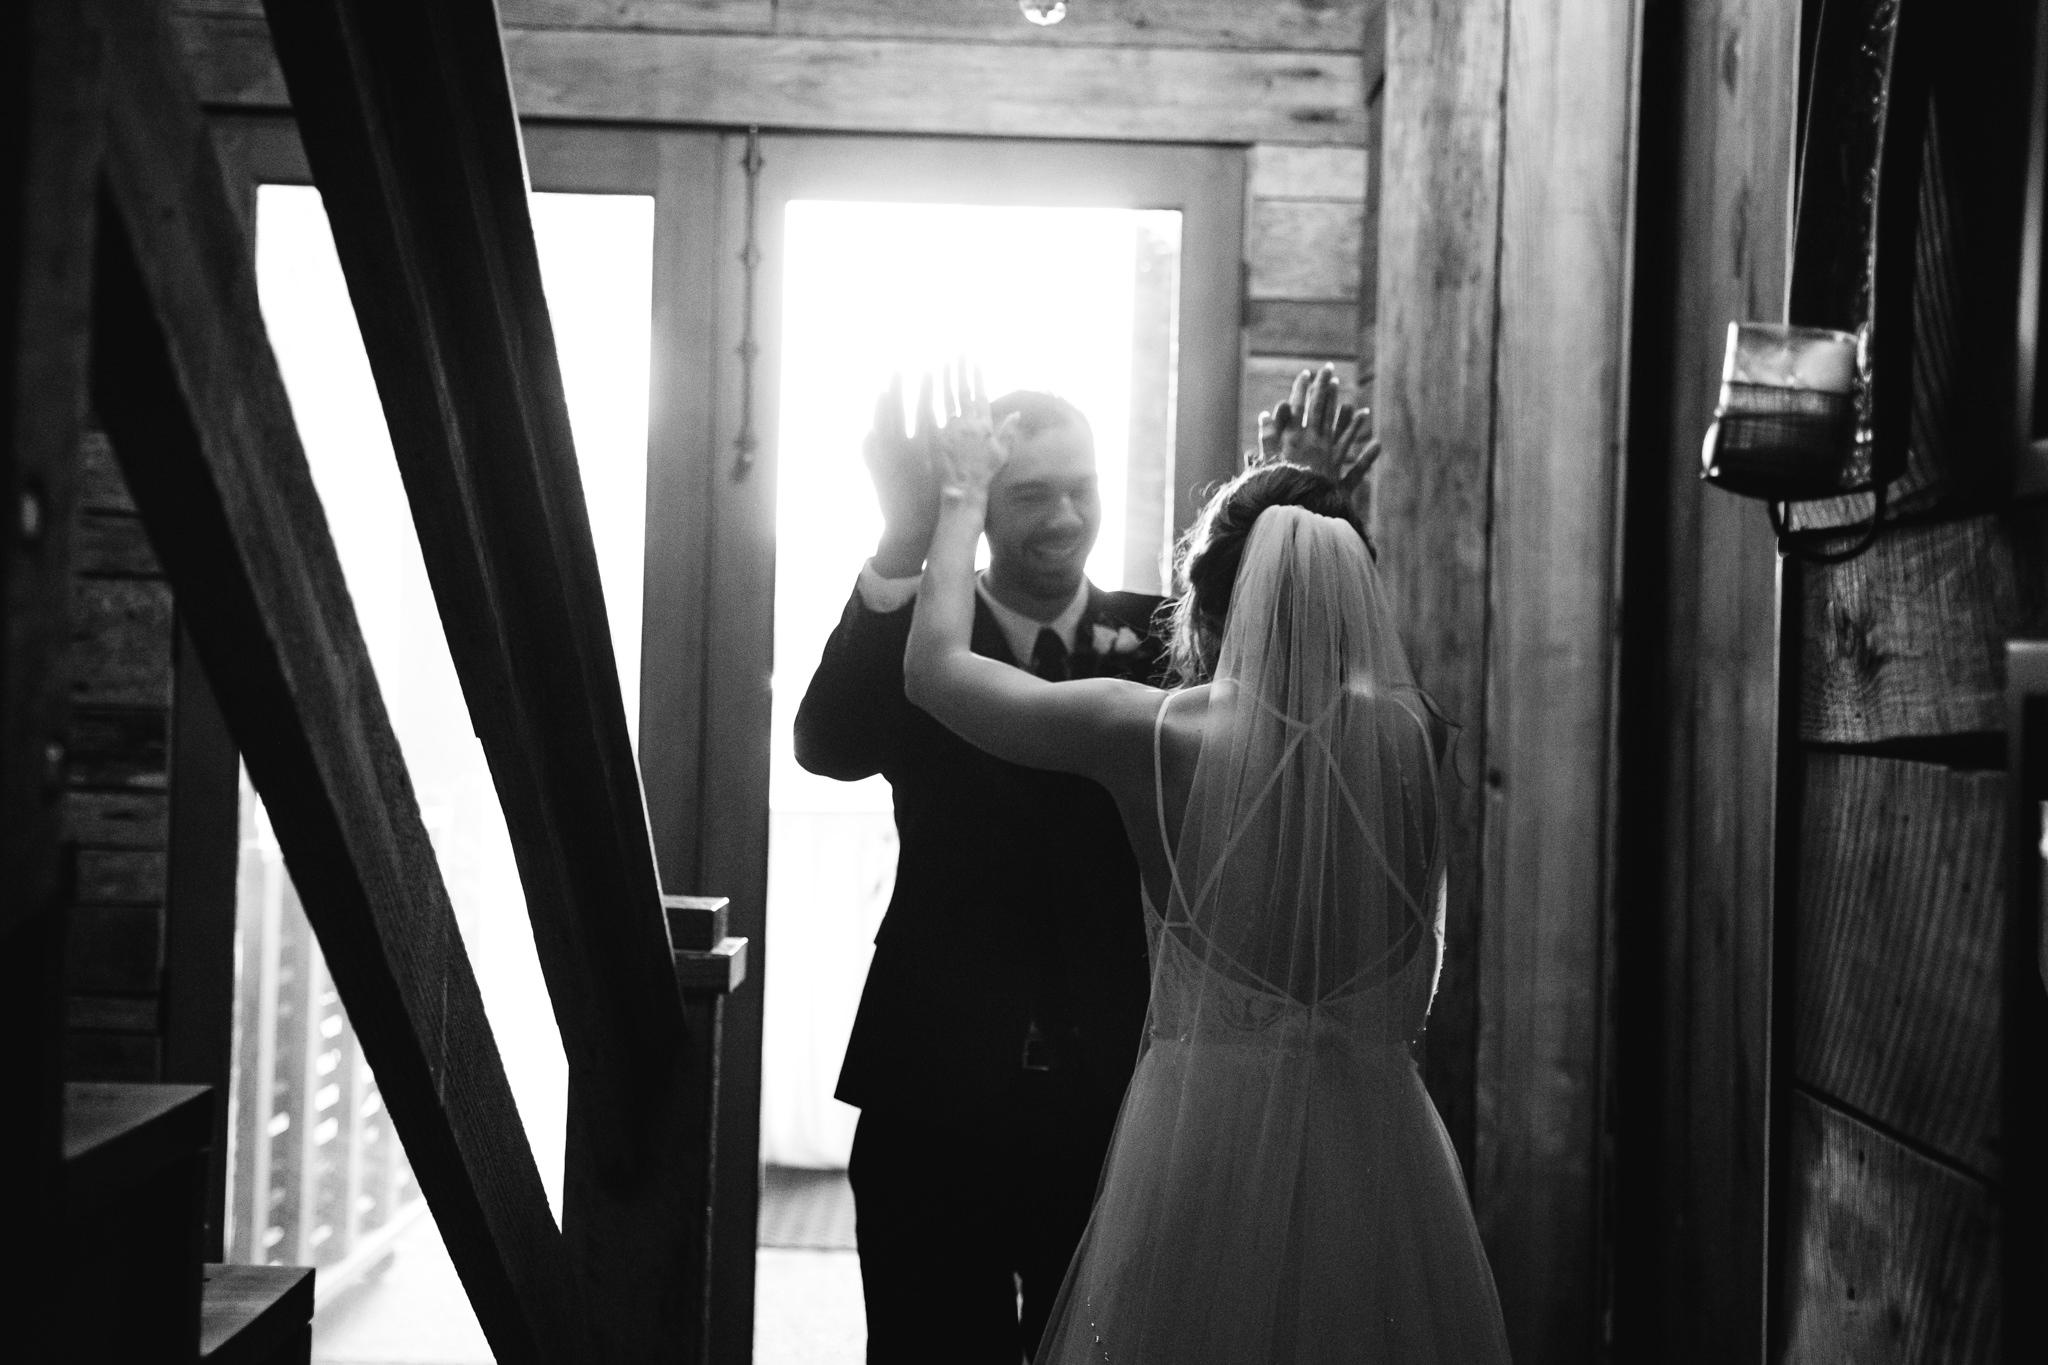 phantom-canyon-brewery-colorado-springs-wedding-photographer-407.jpg